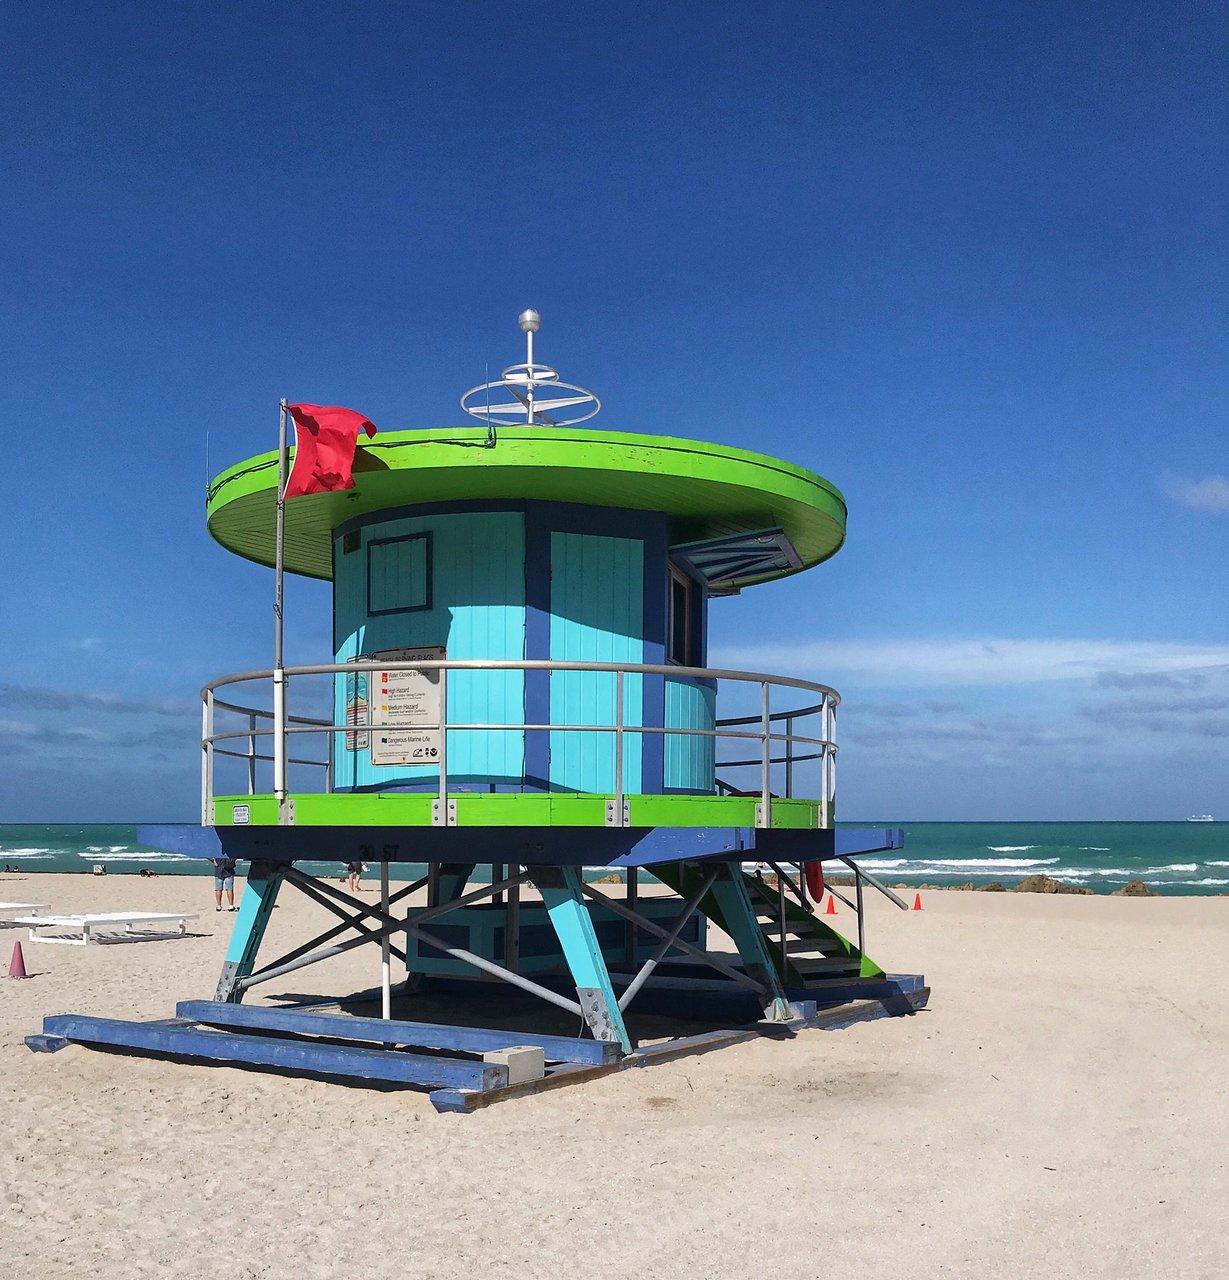 Miami Beach Boardwalk 2020 All You